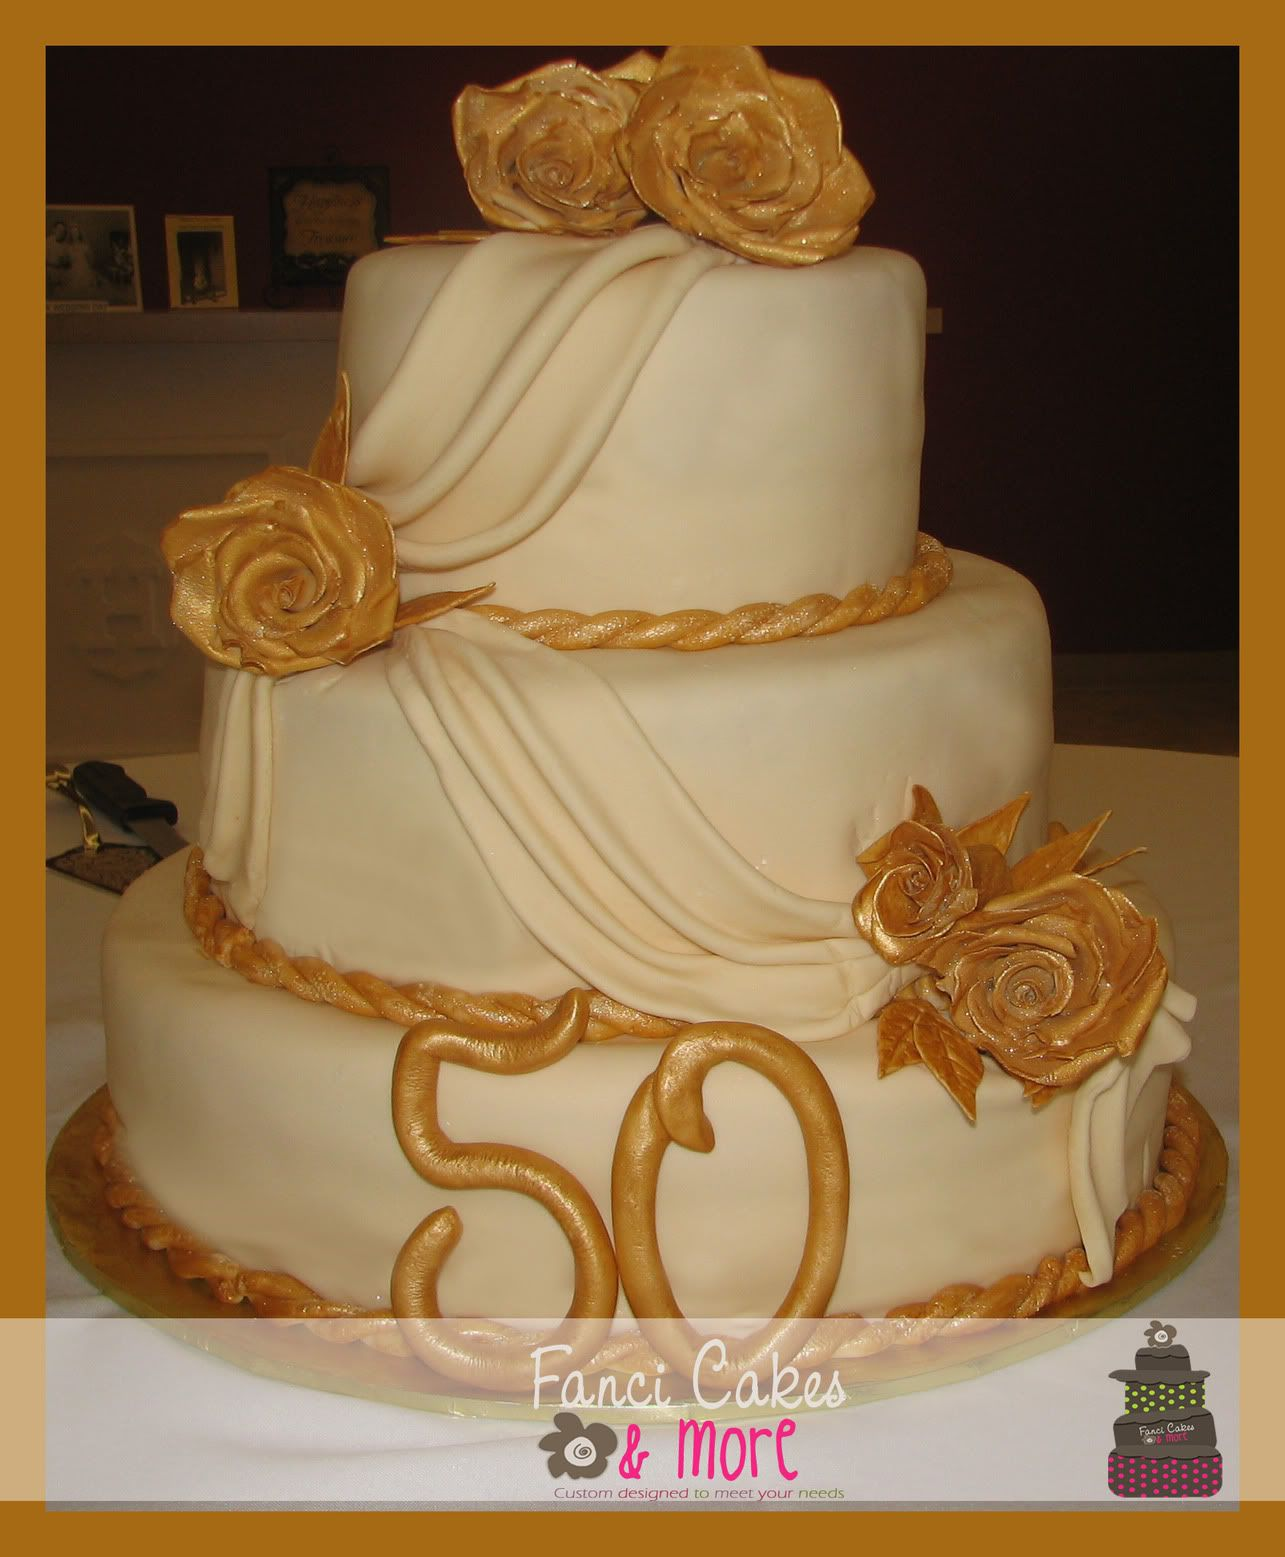 50th Anniversary Sheet Cake Designs | Description from 50th Birthday ...